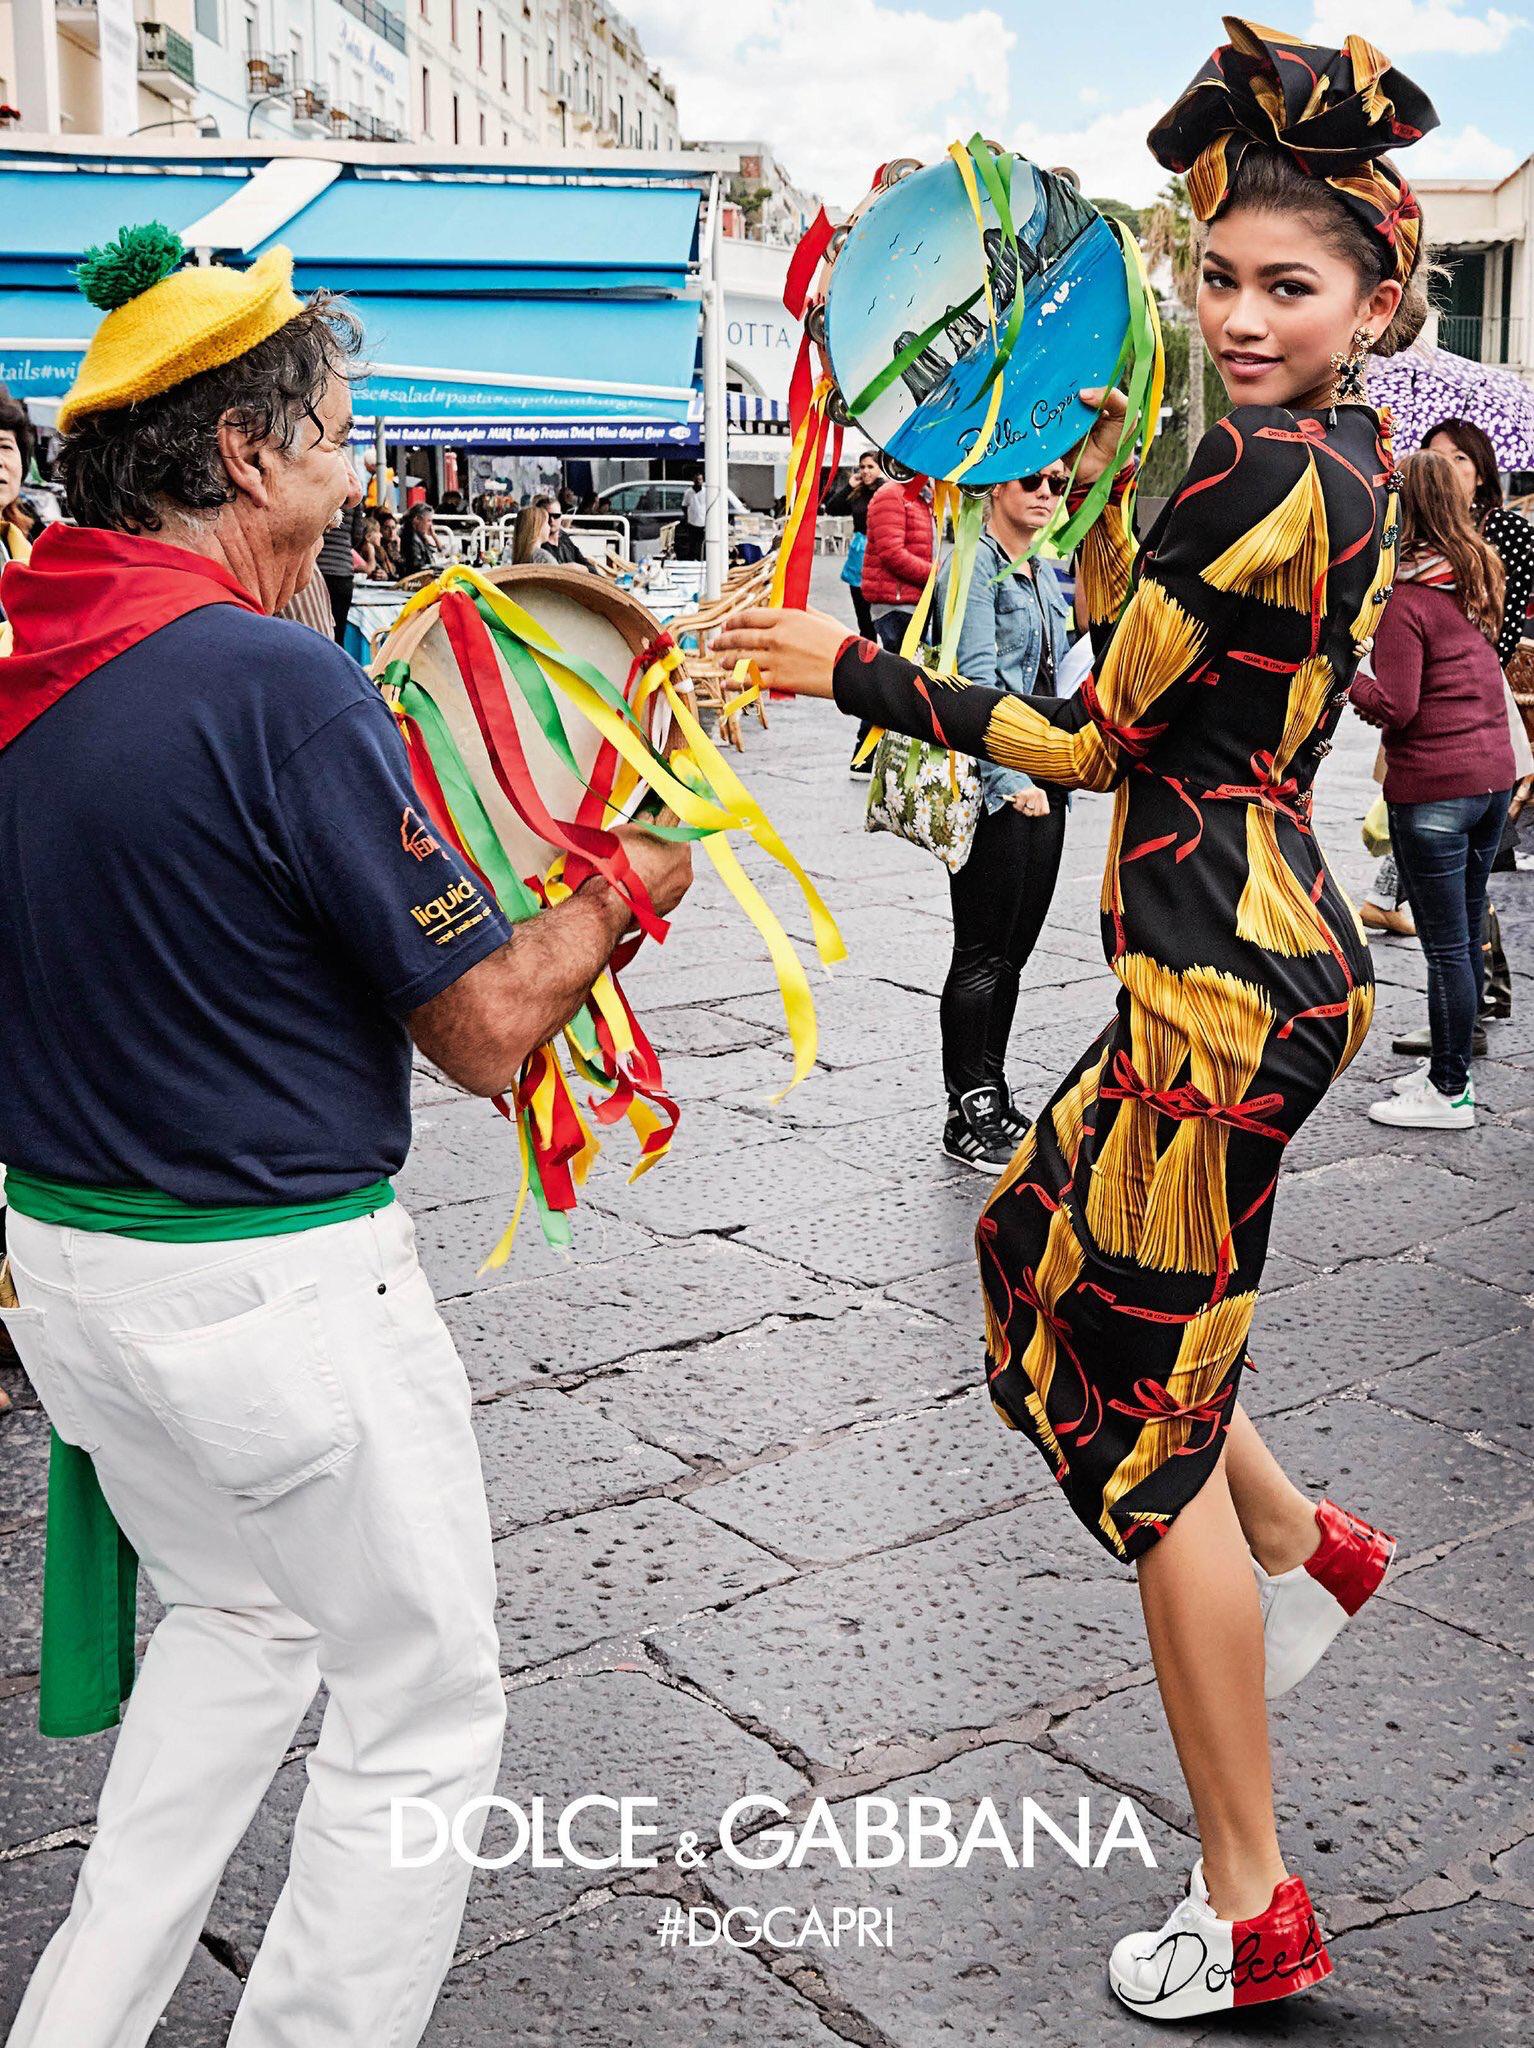 Zendaya in the  DolceGabbana Capri Ad Campaign  DGCapri  4ede432a29